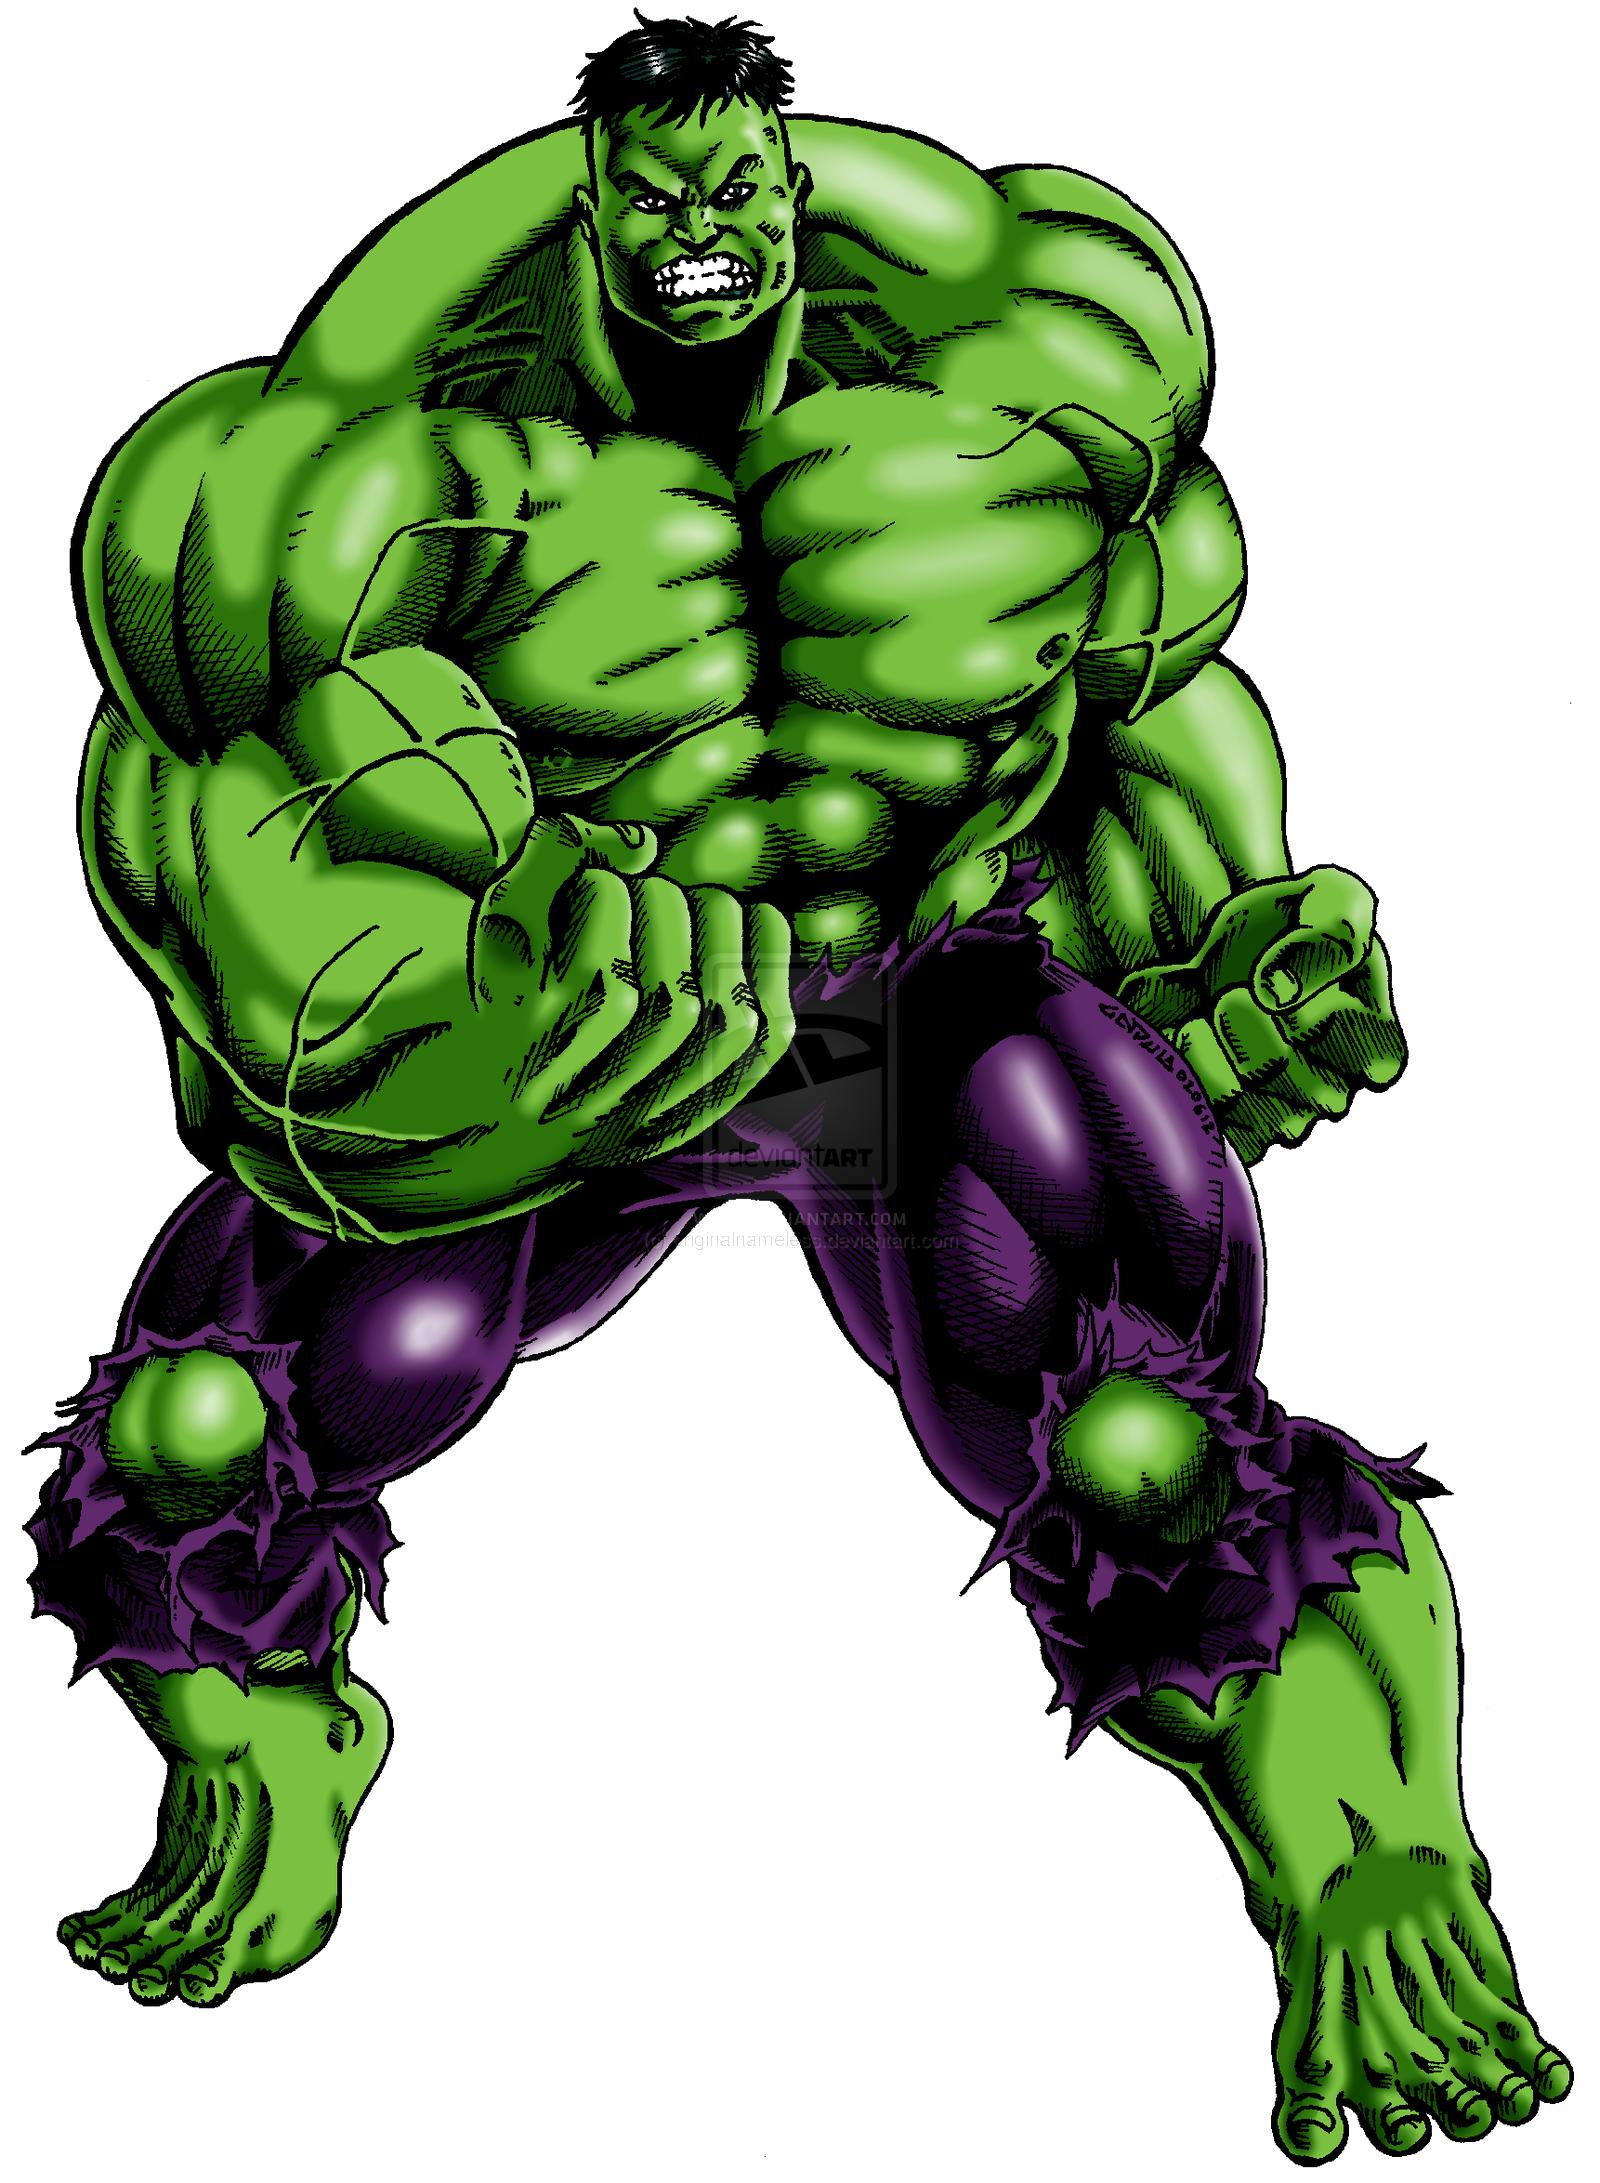 download hulk picture hq png image freepngimg dog tag clip art image dog tag clip art free